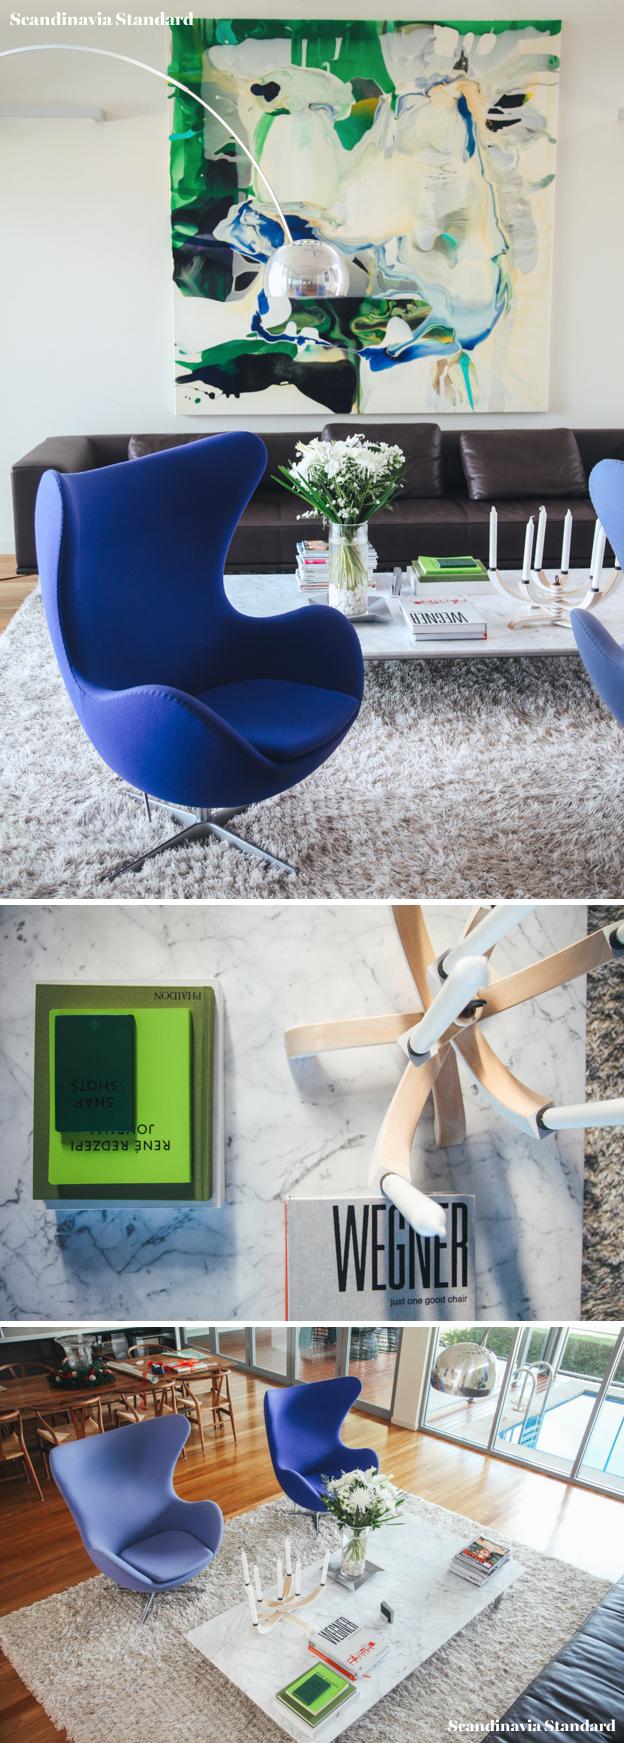 The White Room McOmish House Living Room   Scandinavia Standard